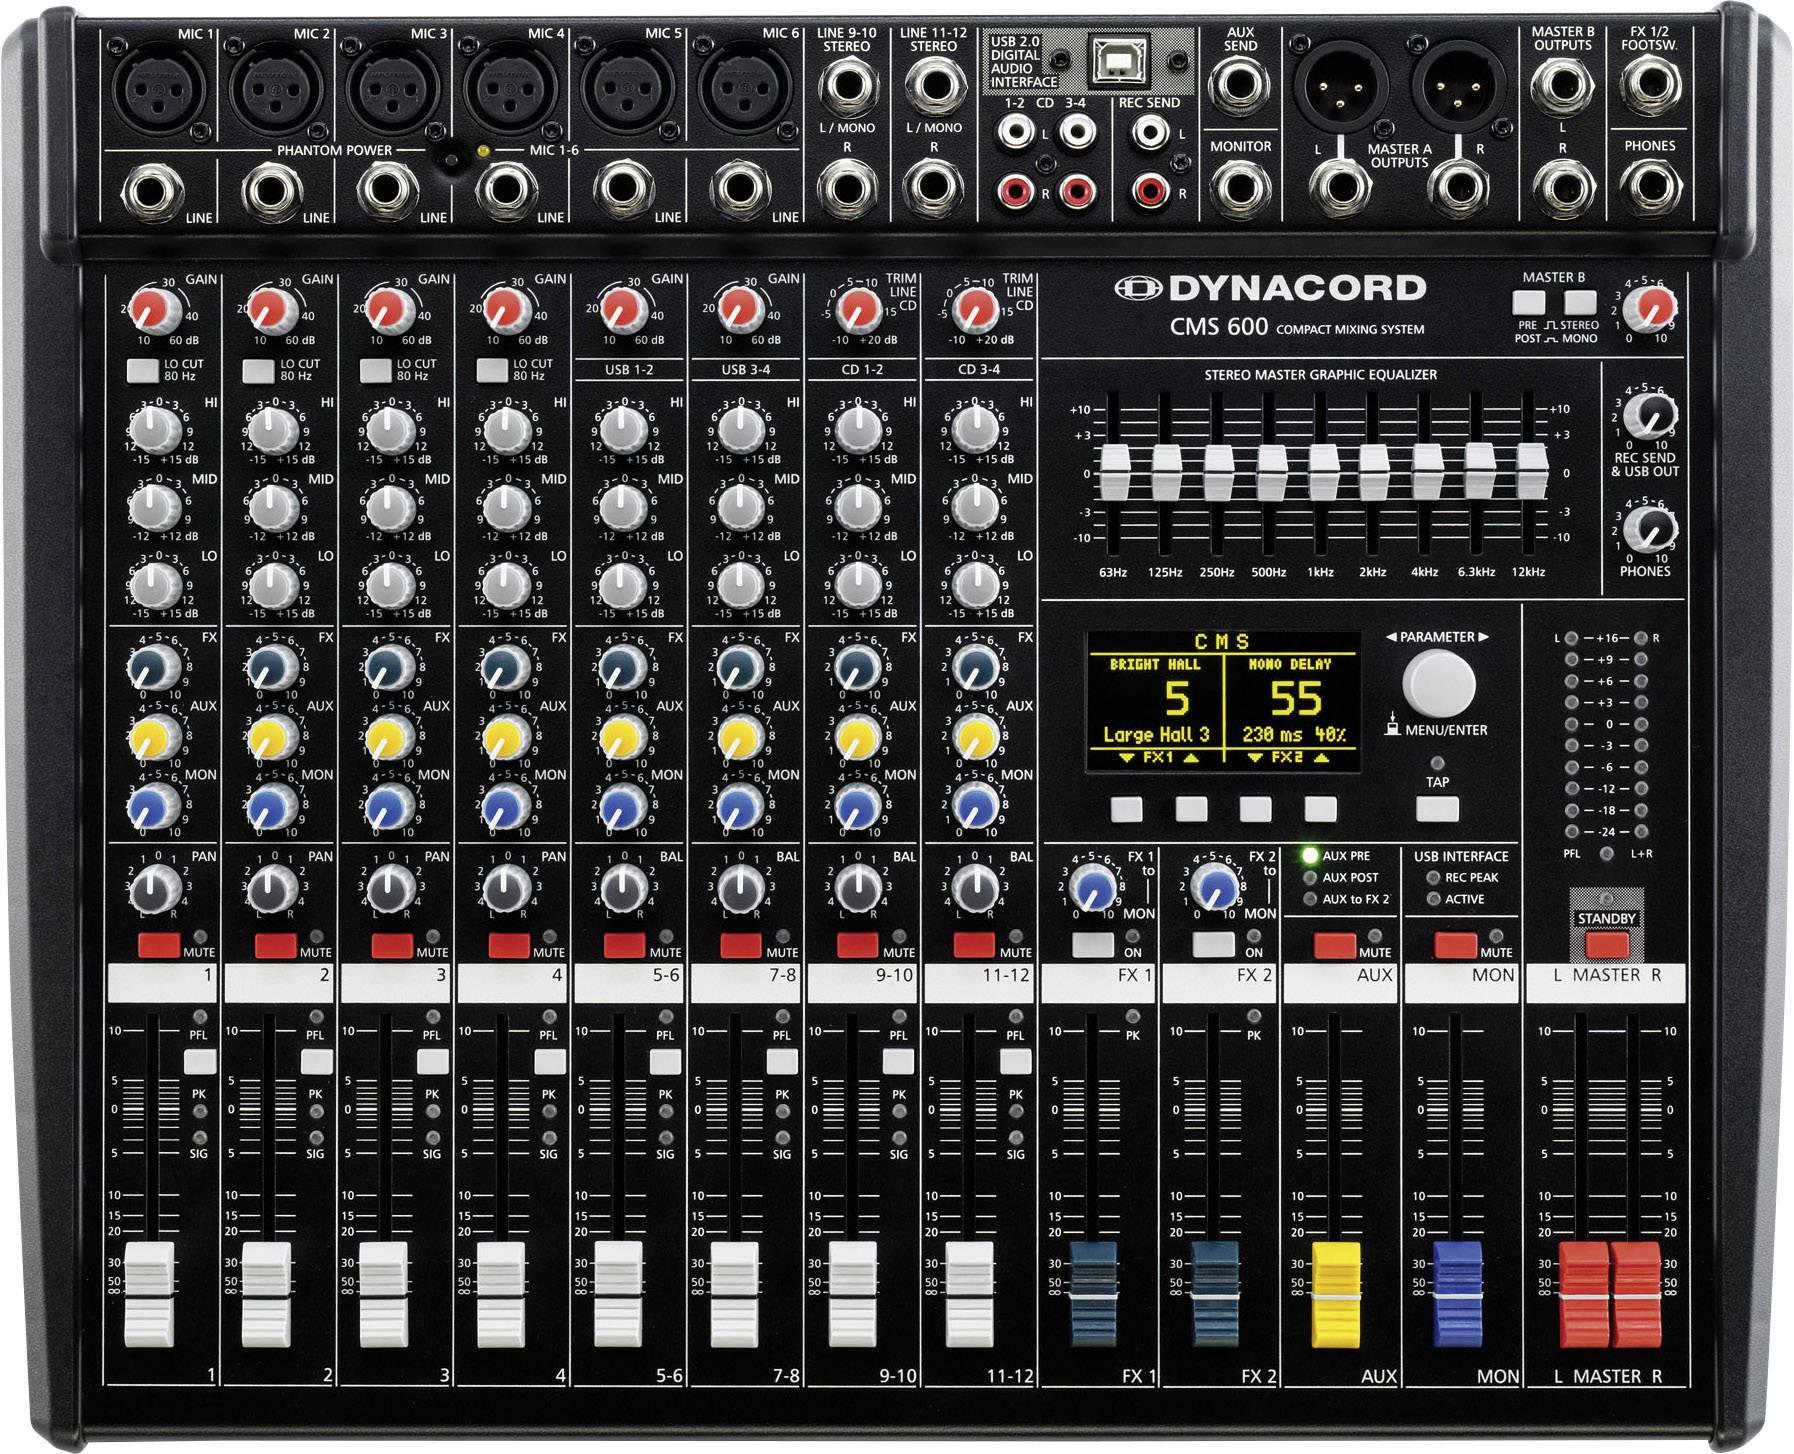 Dynacord CMS 600-3 Mixer DJ Numero canali:8